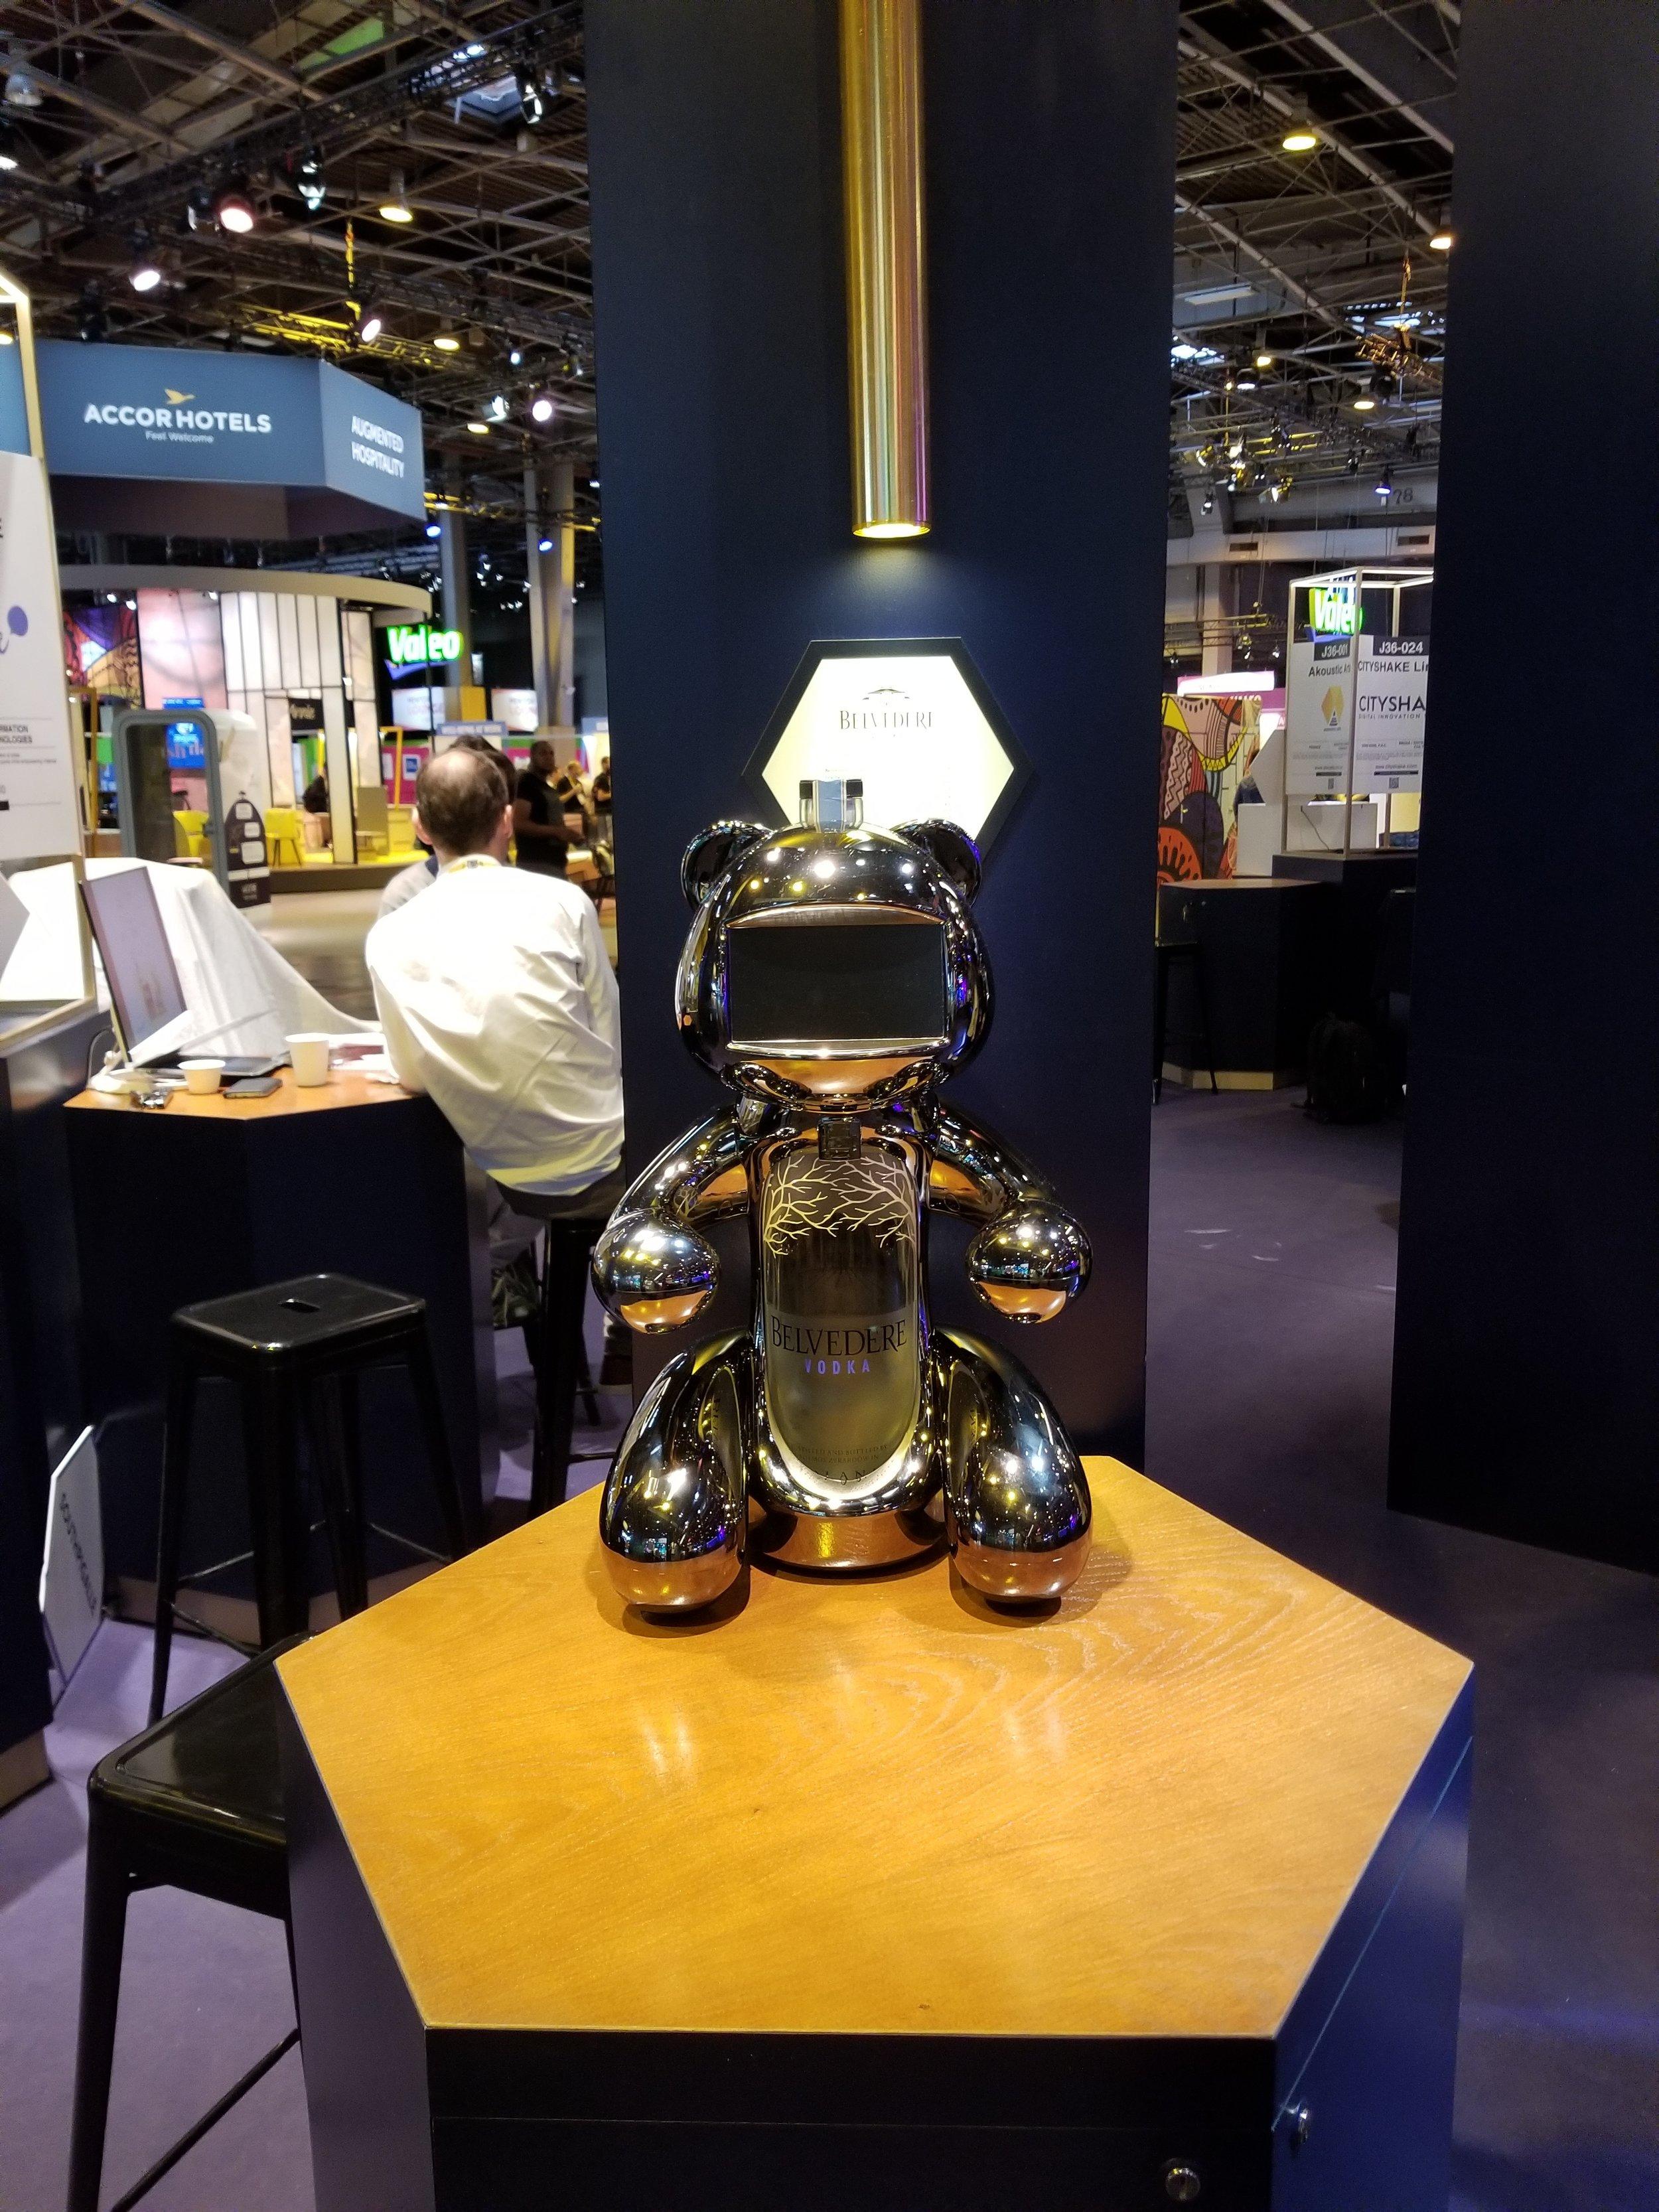 Thank you for the Belvedere vodka metallic robot bear!